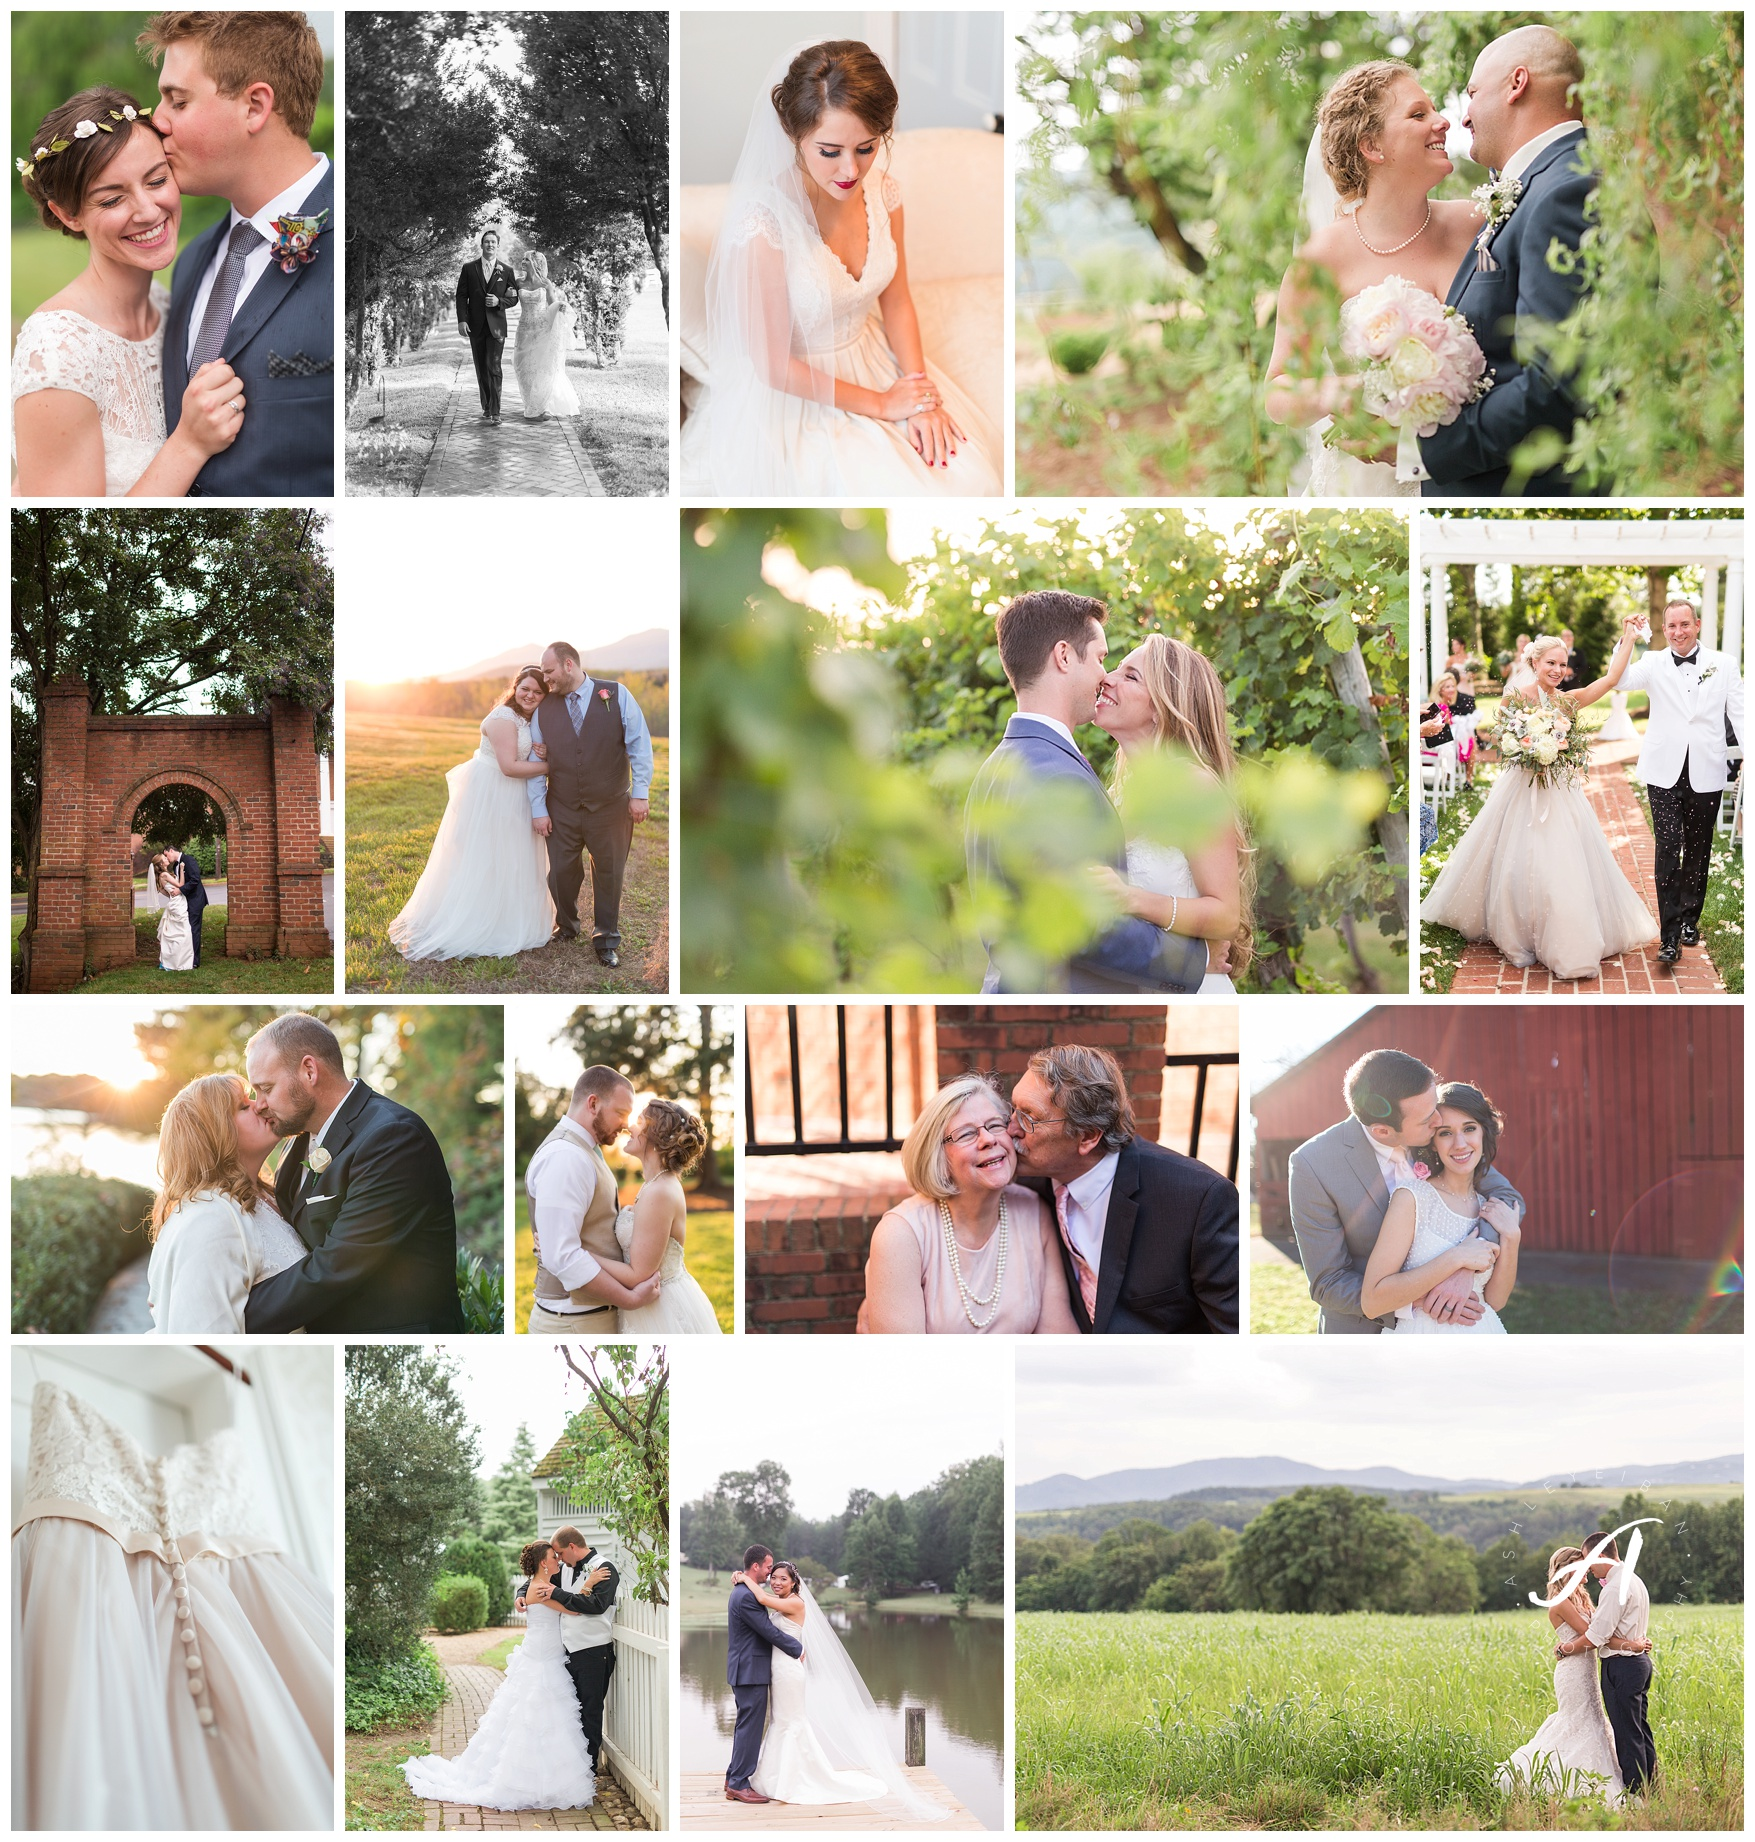 Lynchburg and Charlottesville Wedding Photographer   Central Virginia Wedding Photographers    www.ashleyeiban.com